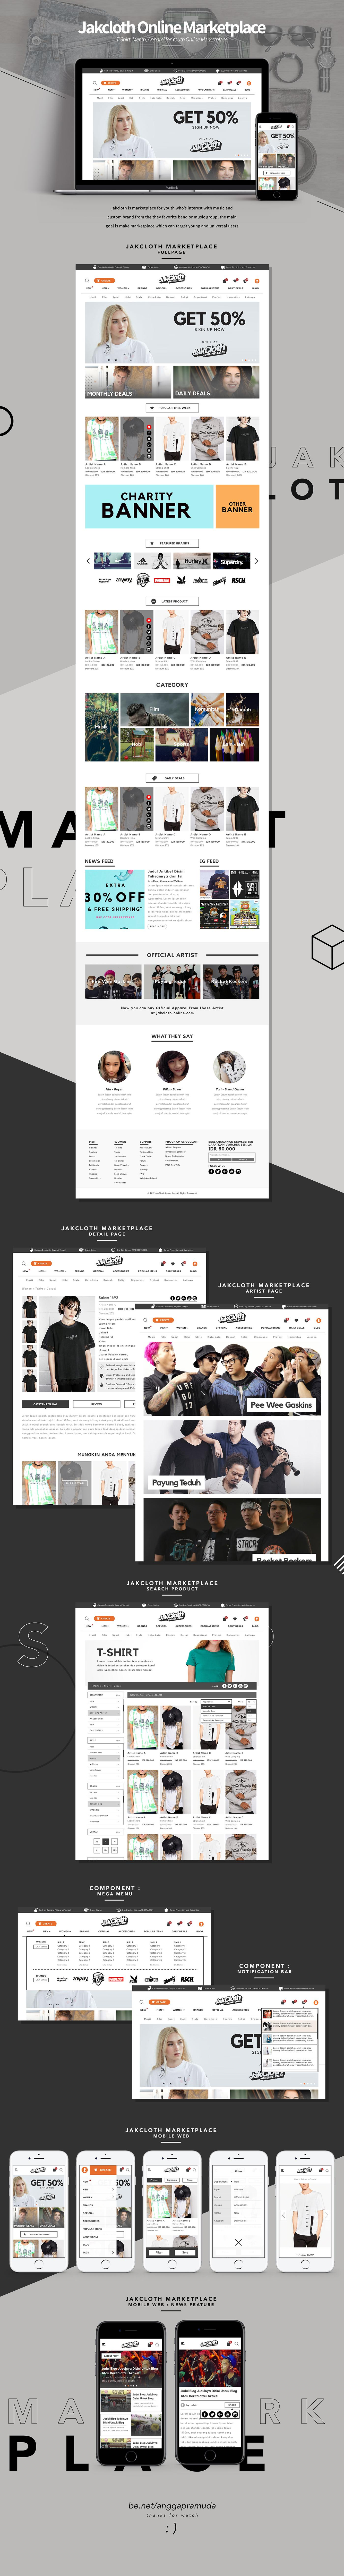 jakcloth,Marketplace,Online shop,apparel,Fashion ,brand